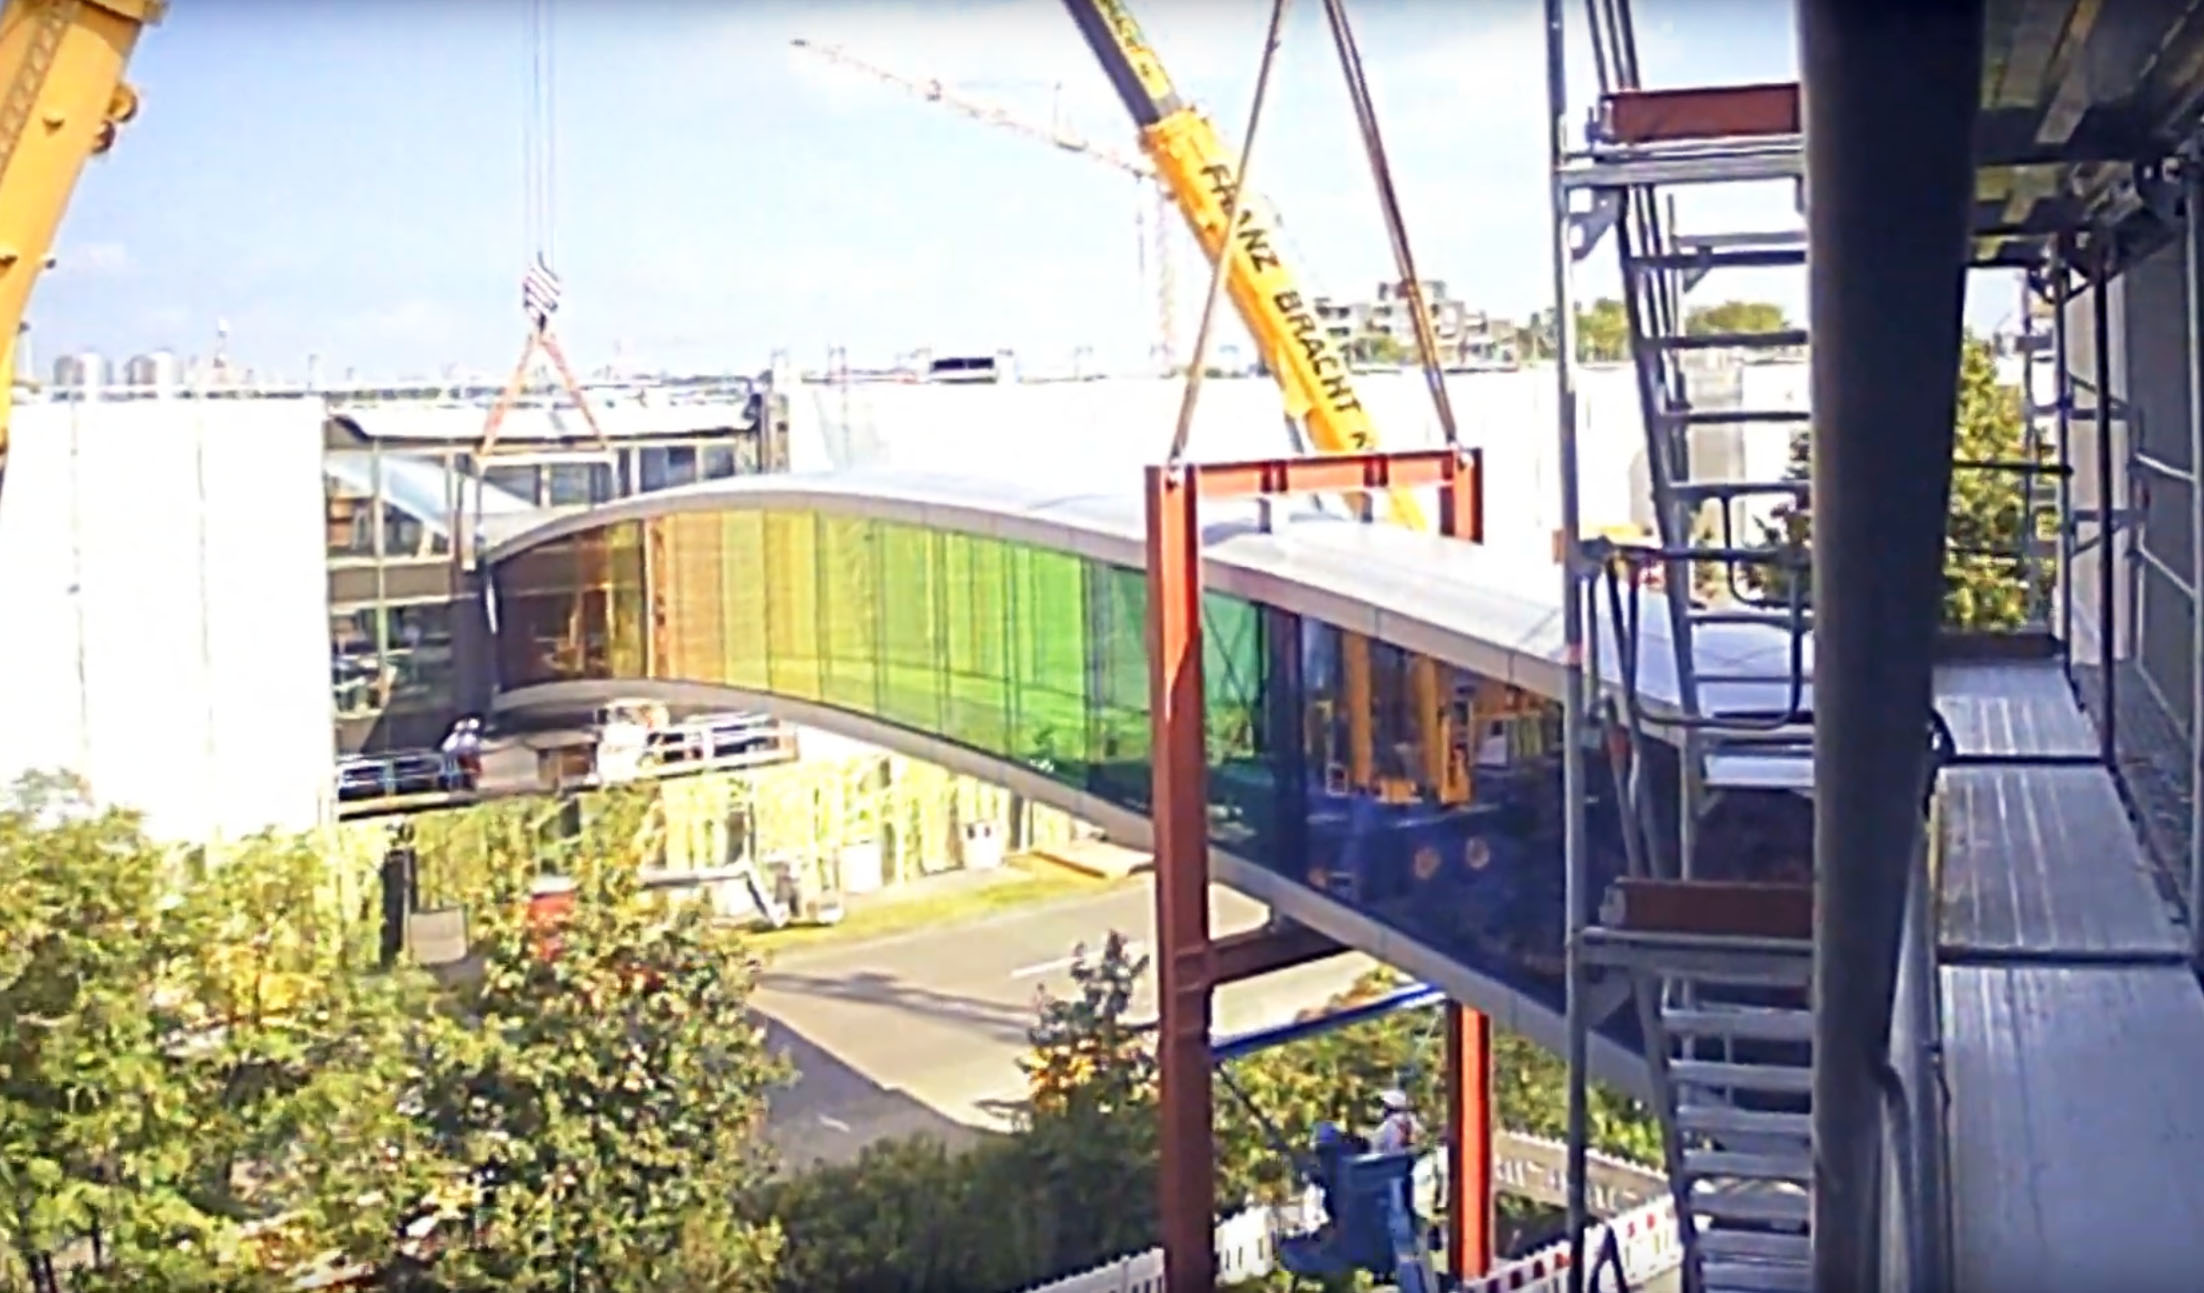 Verbindungsbrücke Youtube Screenshot Münster